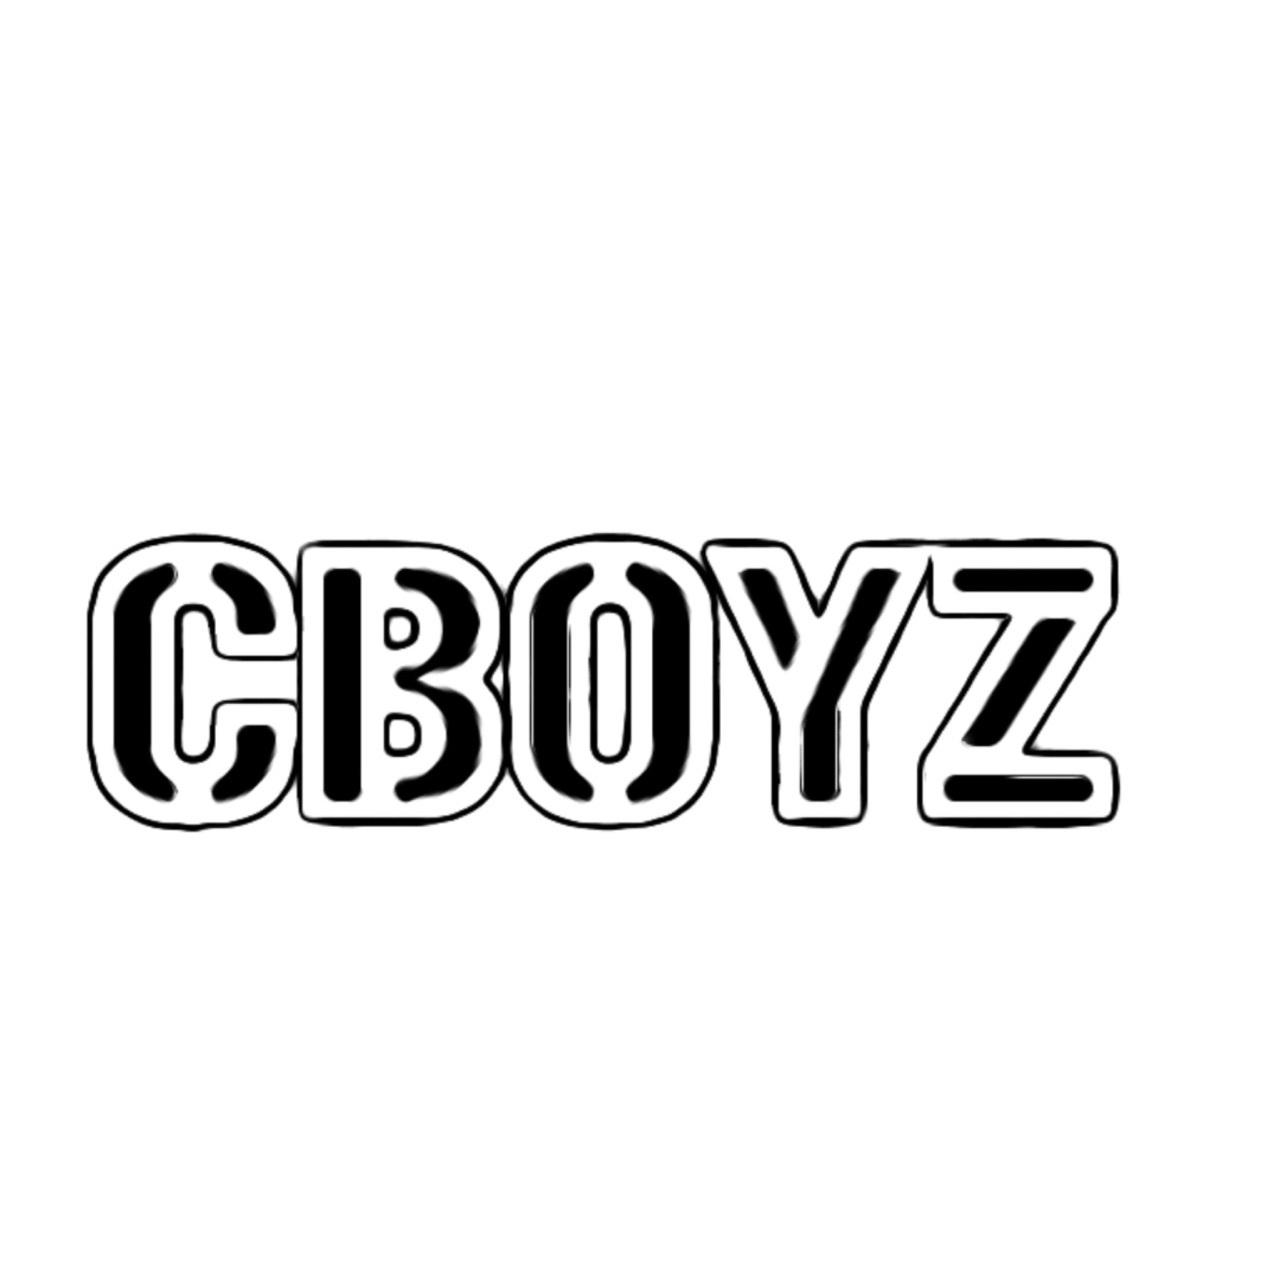 C Boyz merchandise  Store